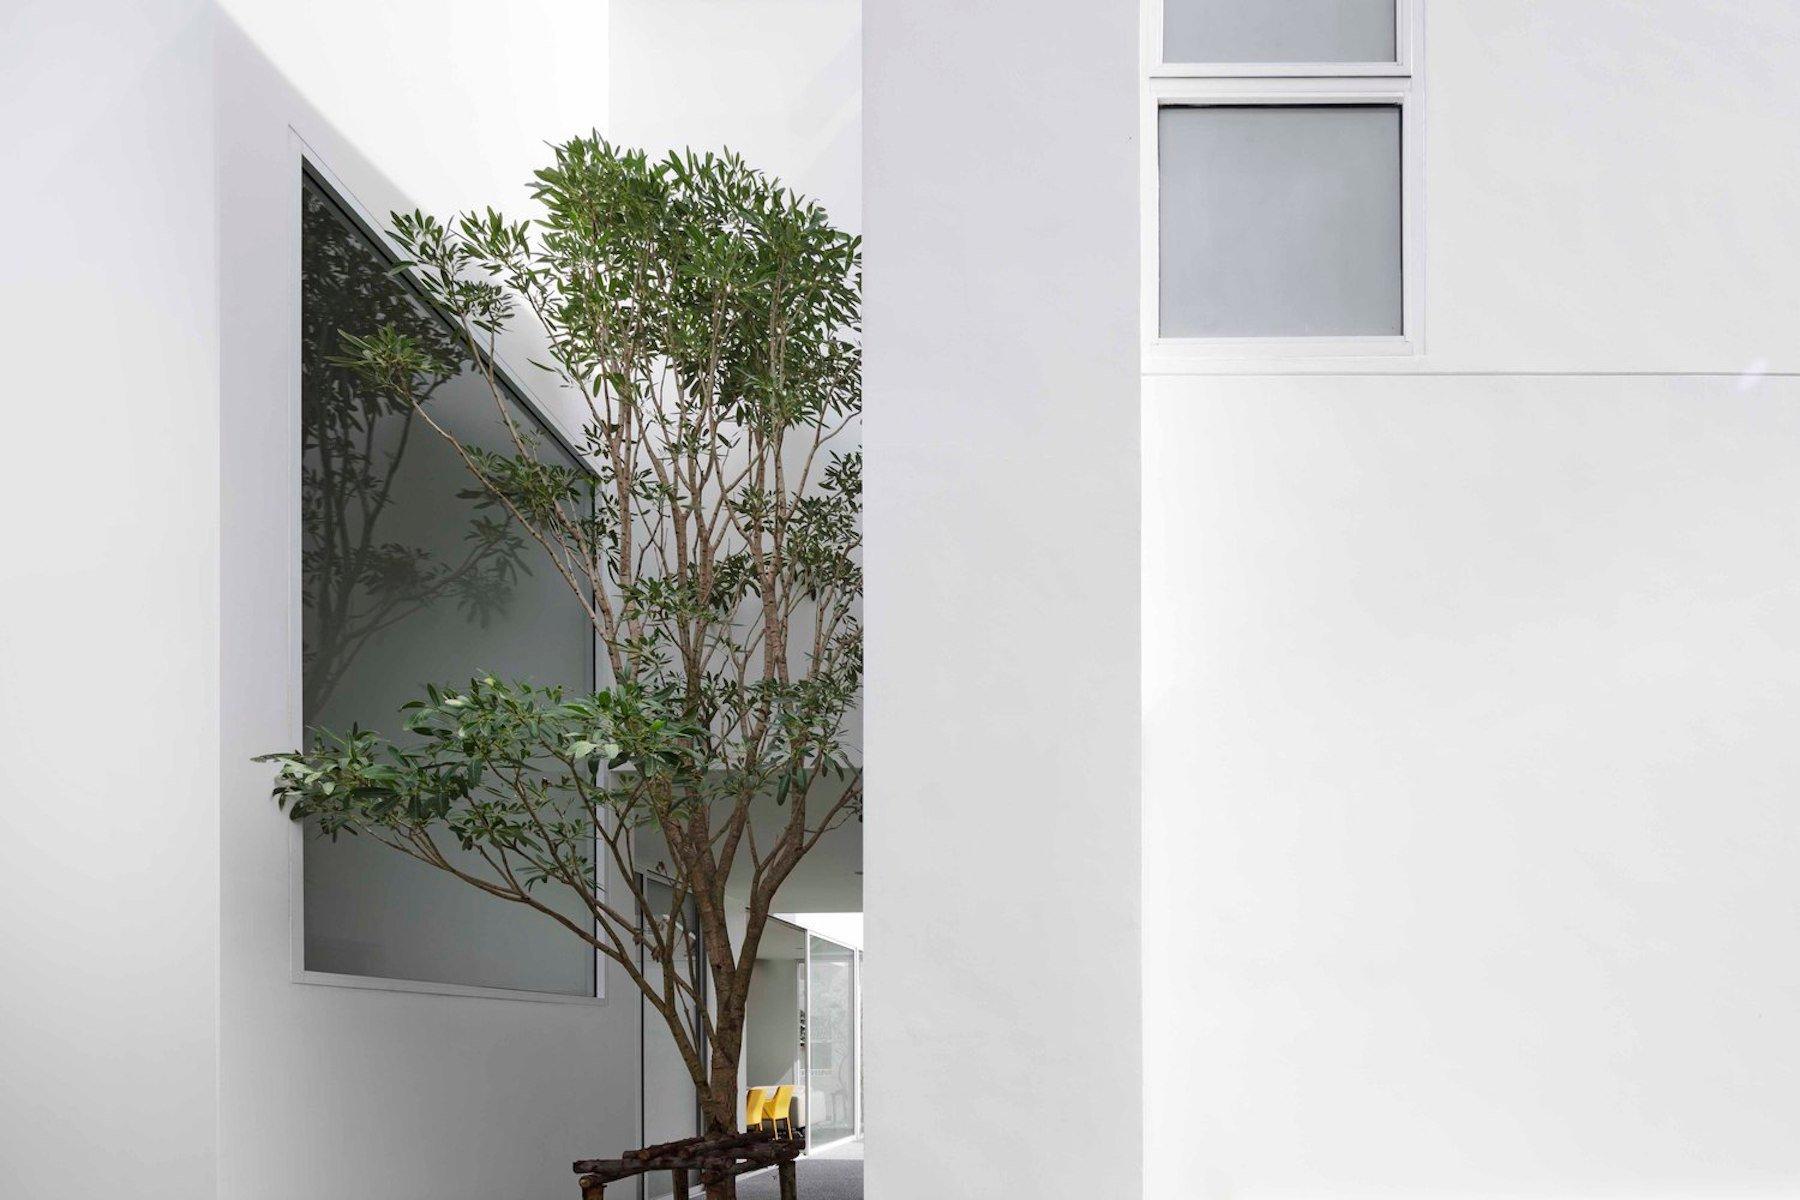 iGNANT-Architecture-Ayutt-And-Associates-Design-White-Box-House-01